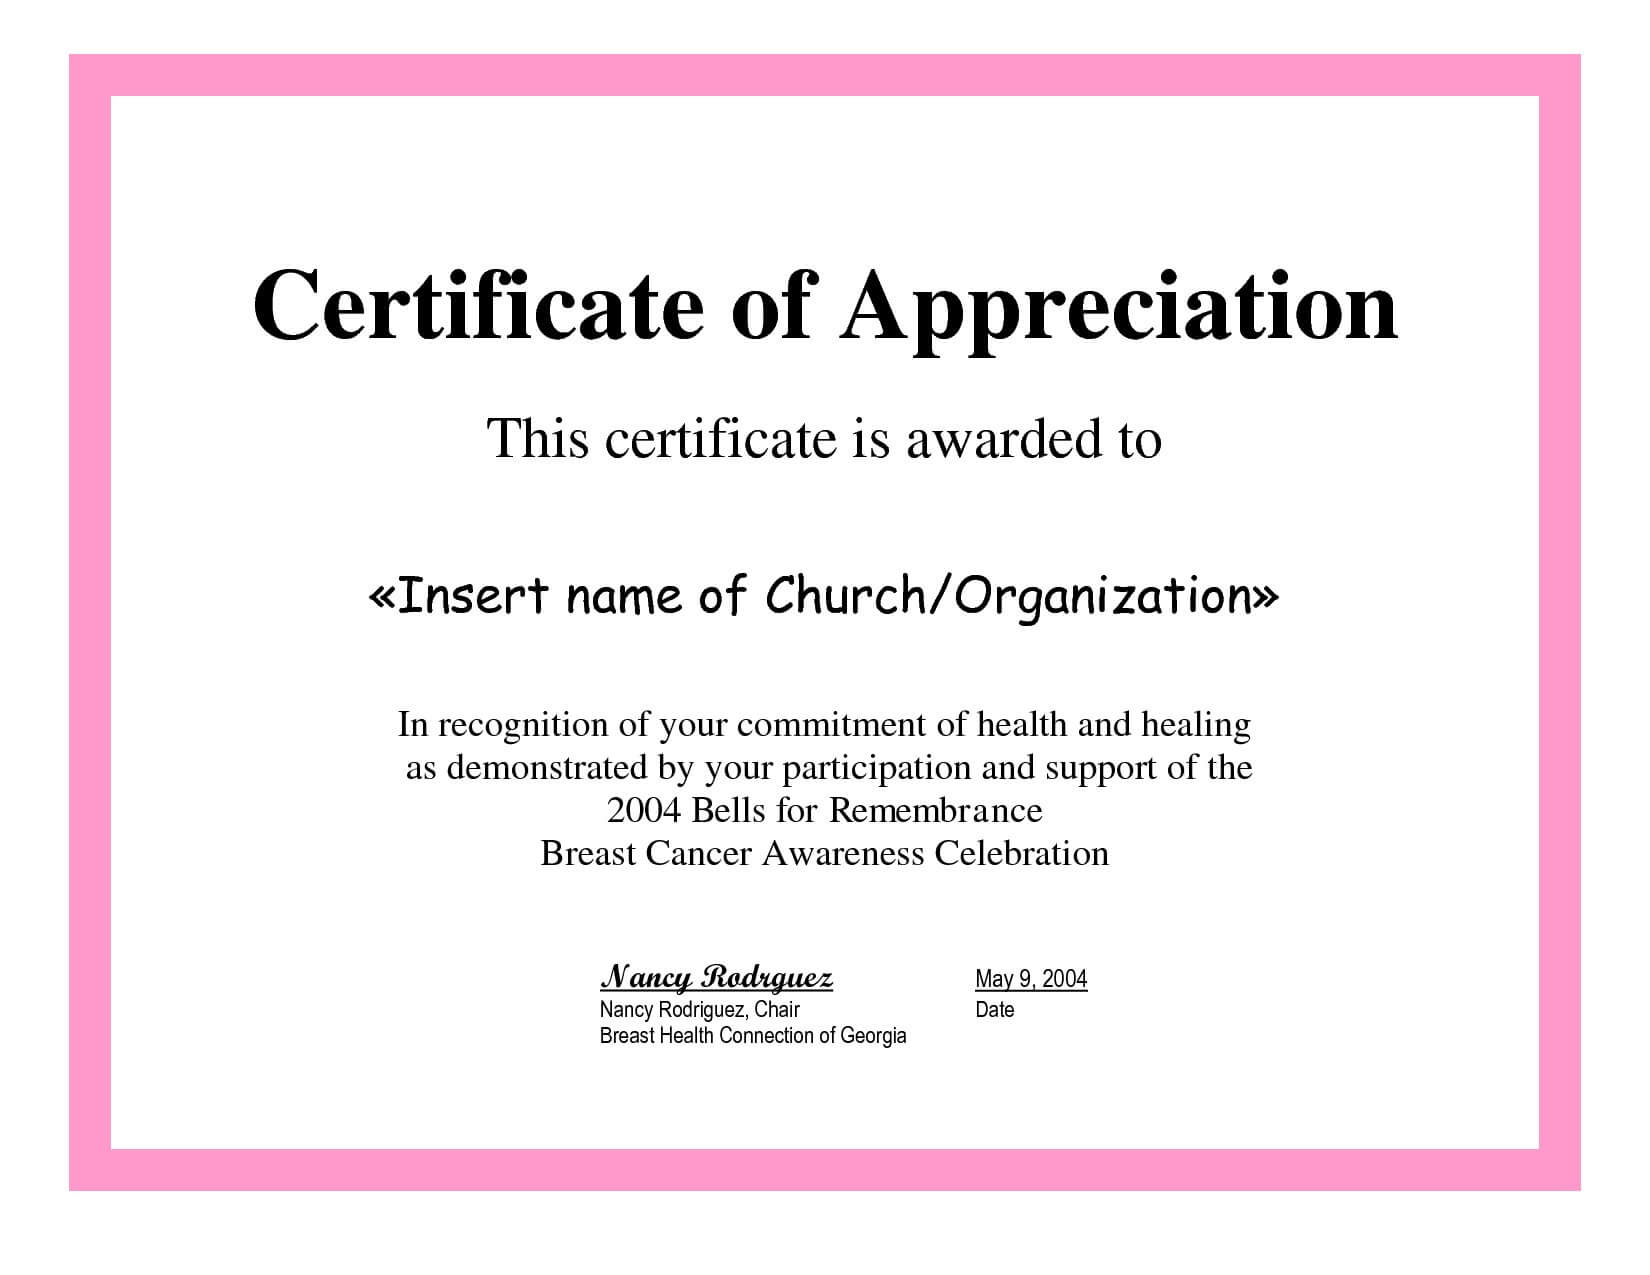 Girl Scout Bridging Certificate Template Free Cub Inside with regard to Choir Certificate Template